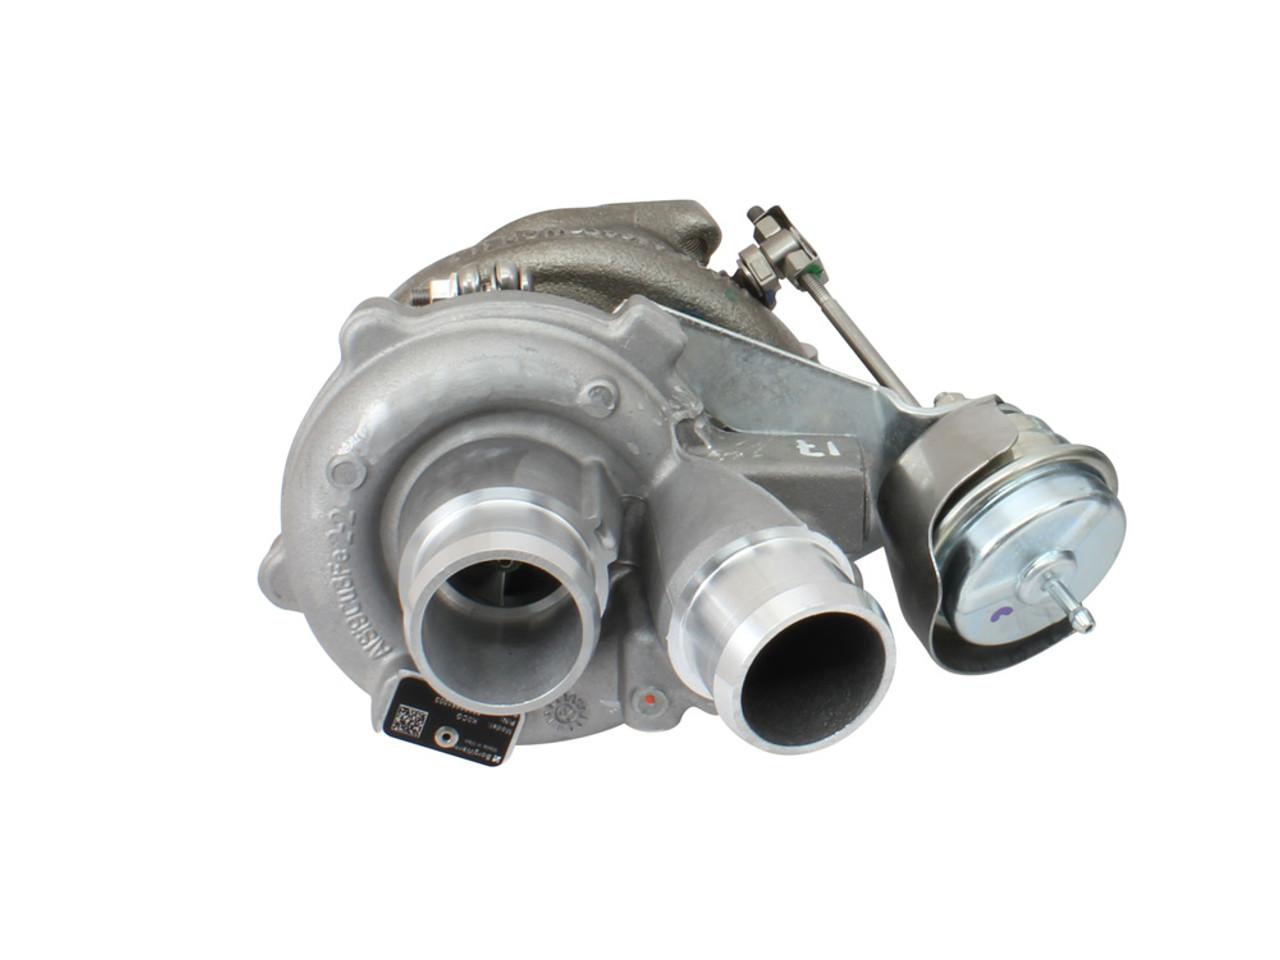 2013-2016 Borg Warner 3.5 Ecoboost F150 Turbo Upgrade 53039881003 Right Side